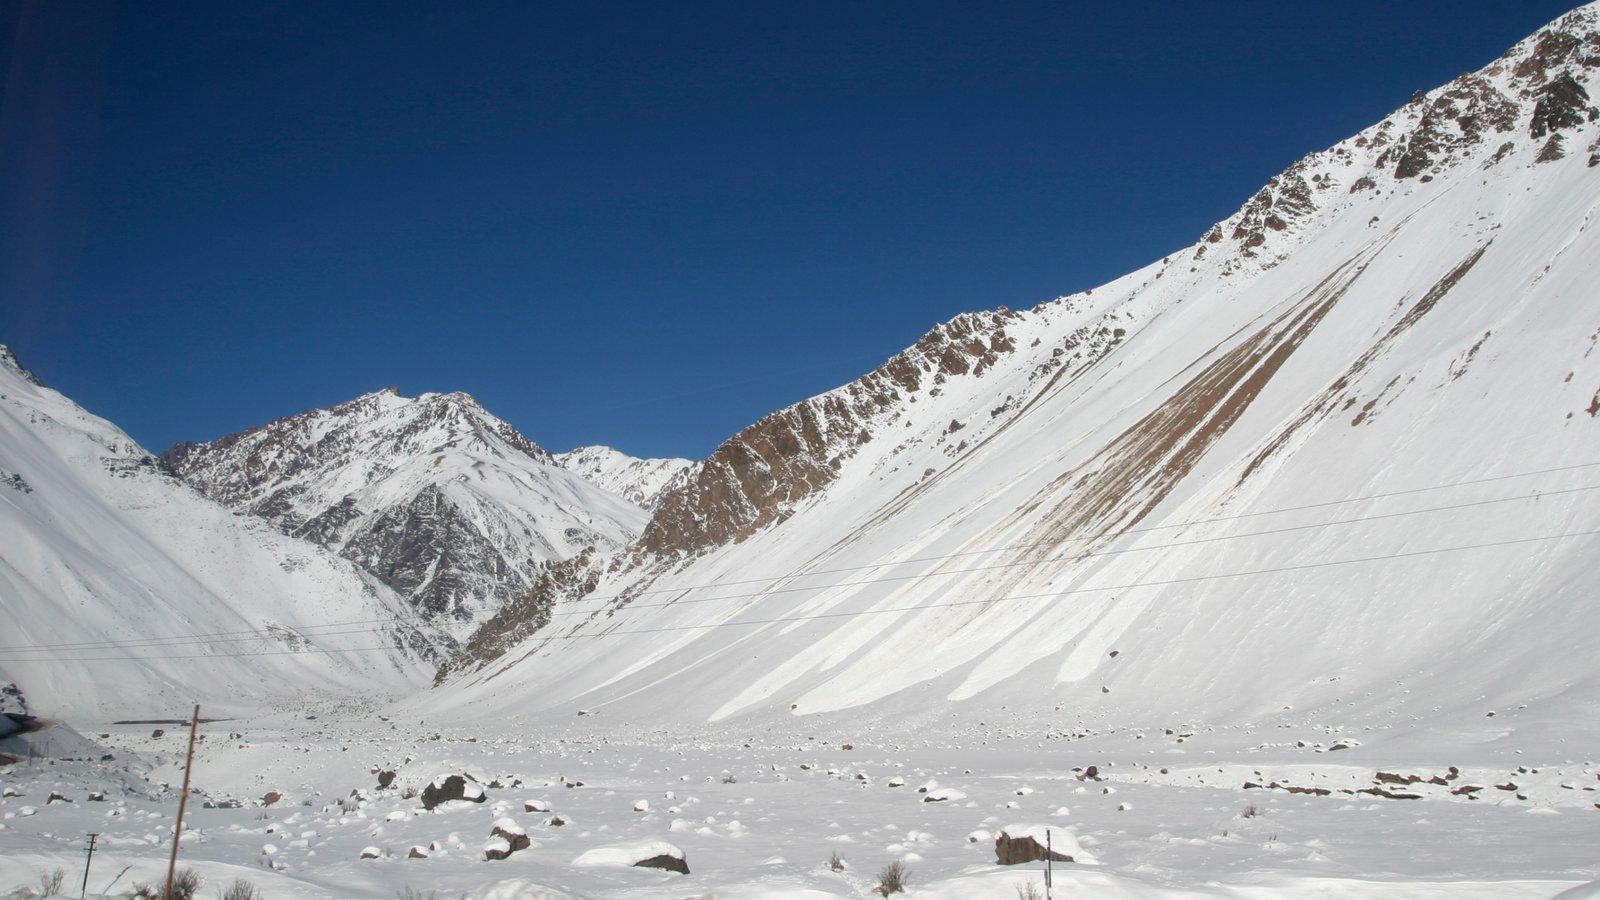 Chile caracterizando neve e montanhas